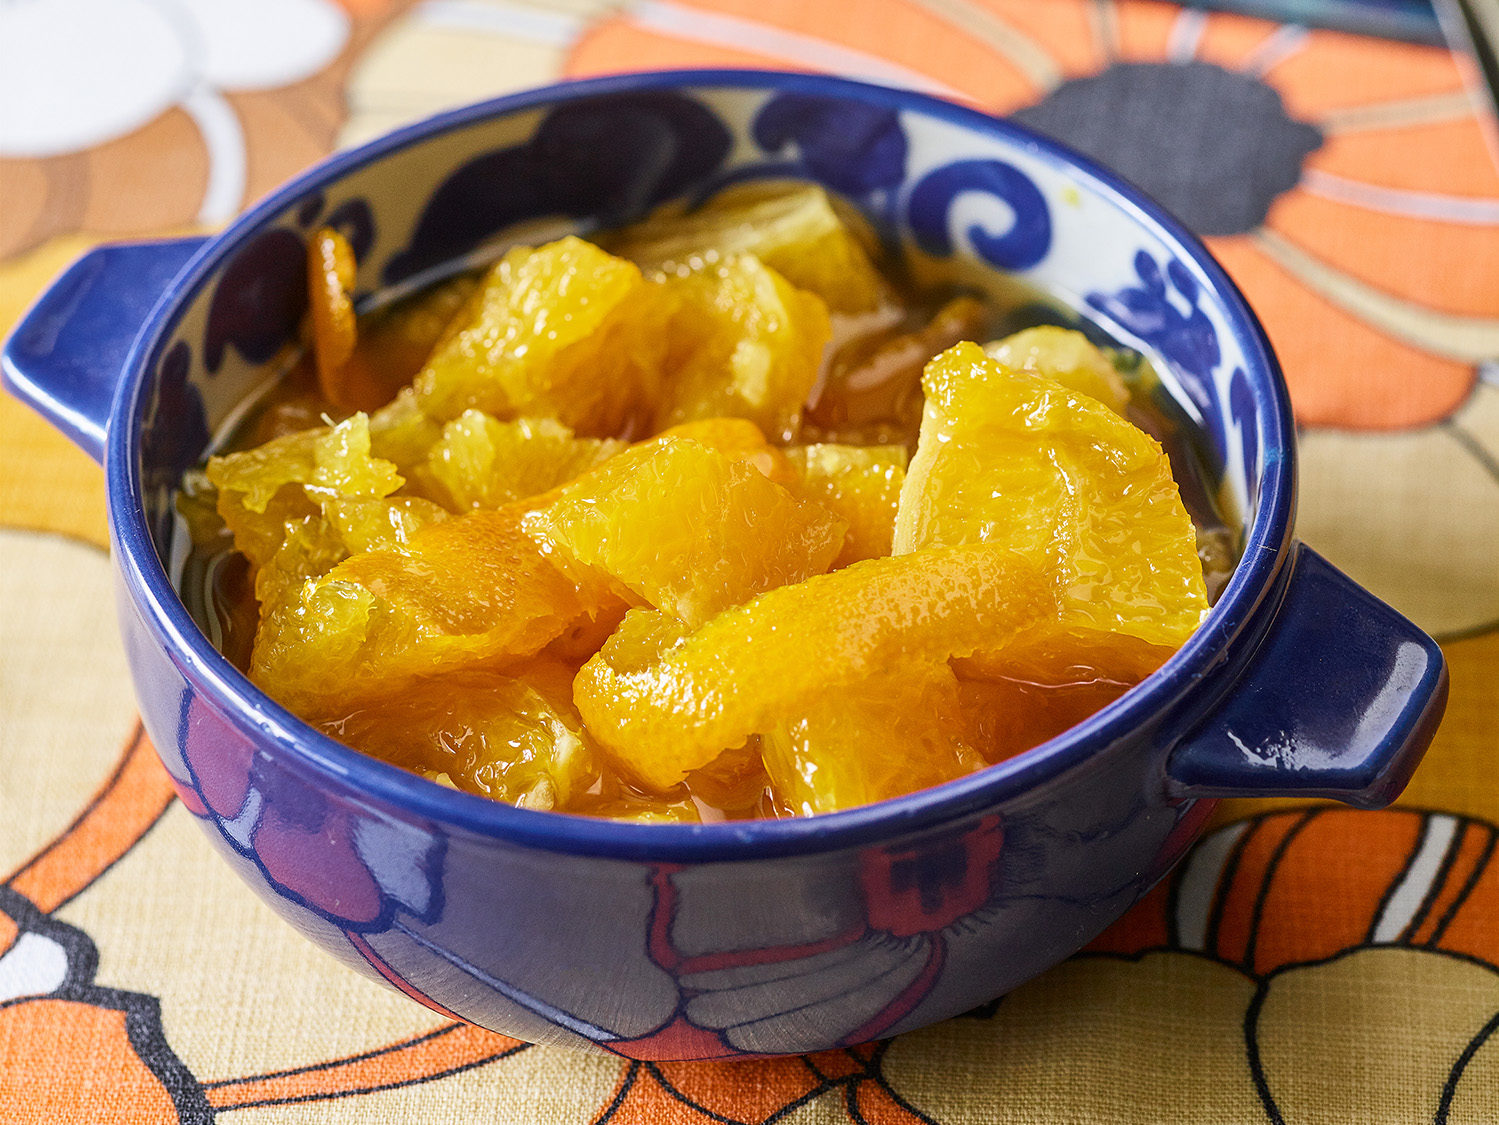 Orange jam in a blue and white ceramic bowl